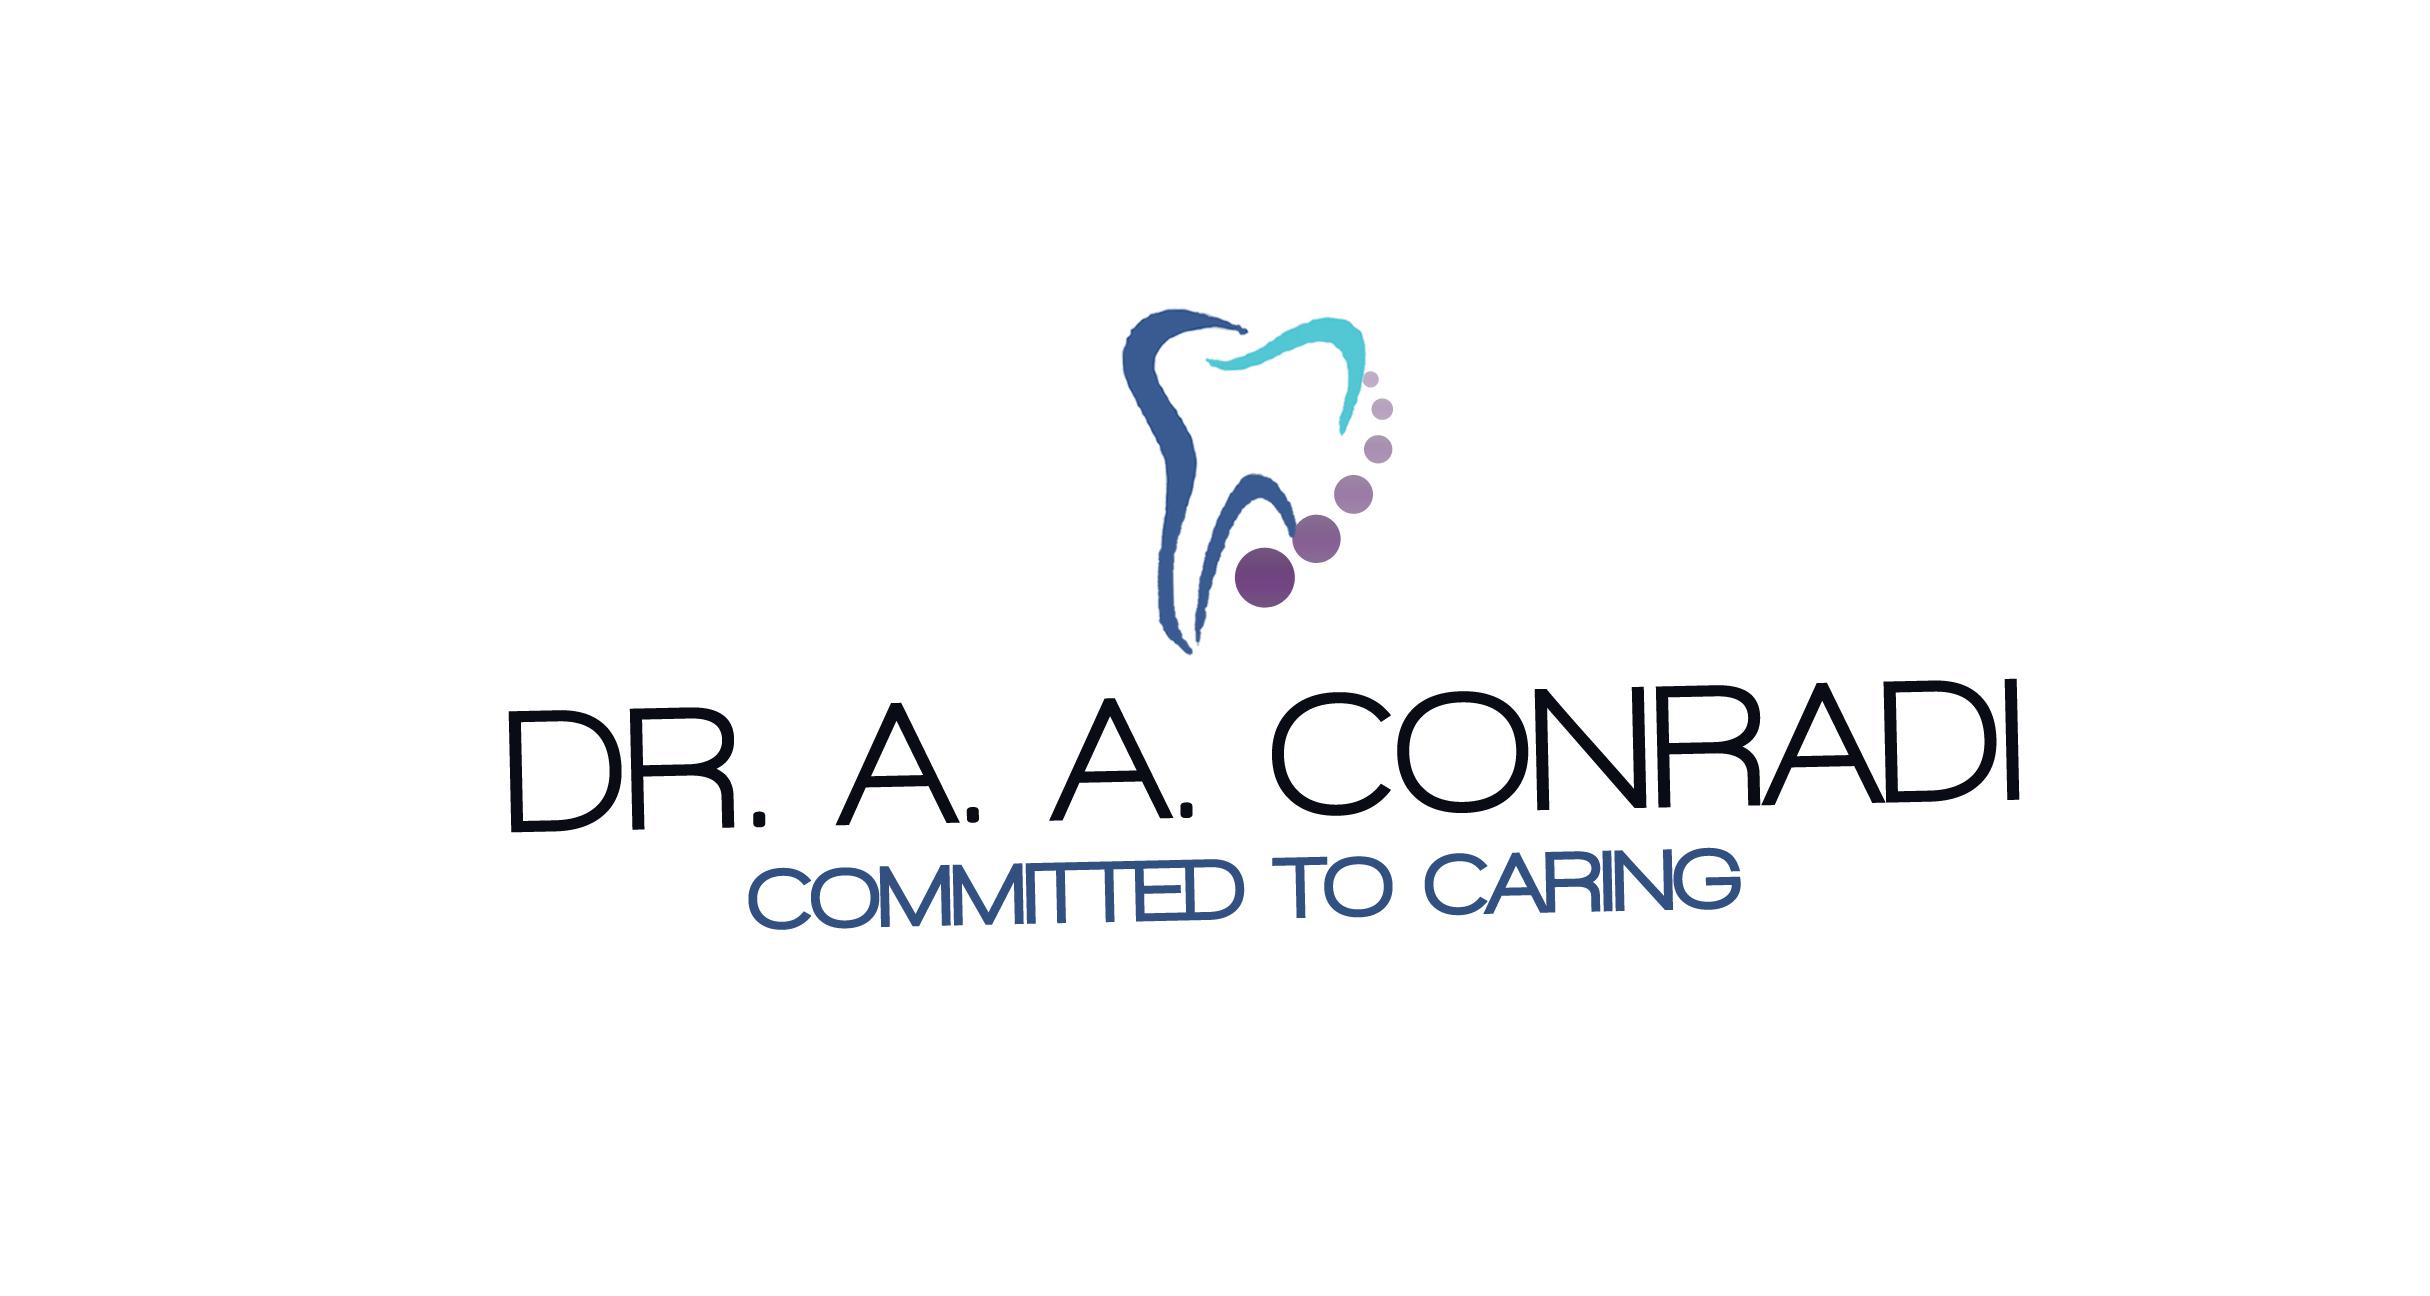 Logo Design by Lama Creative - Entry No. 24 in the Logo Design Contest Unique Logo Design Wanted for Dr. A.A. Conradi.